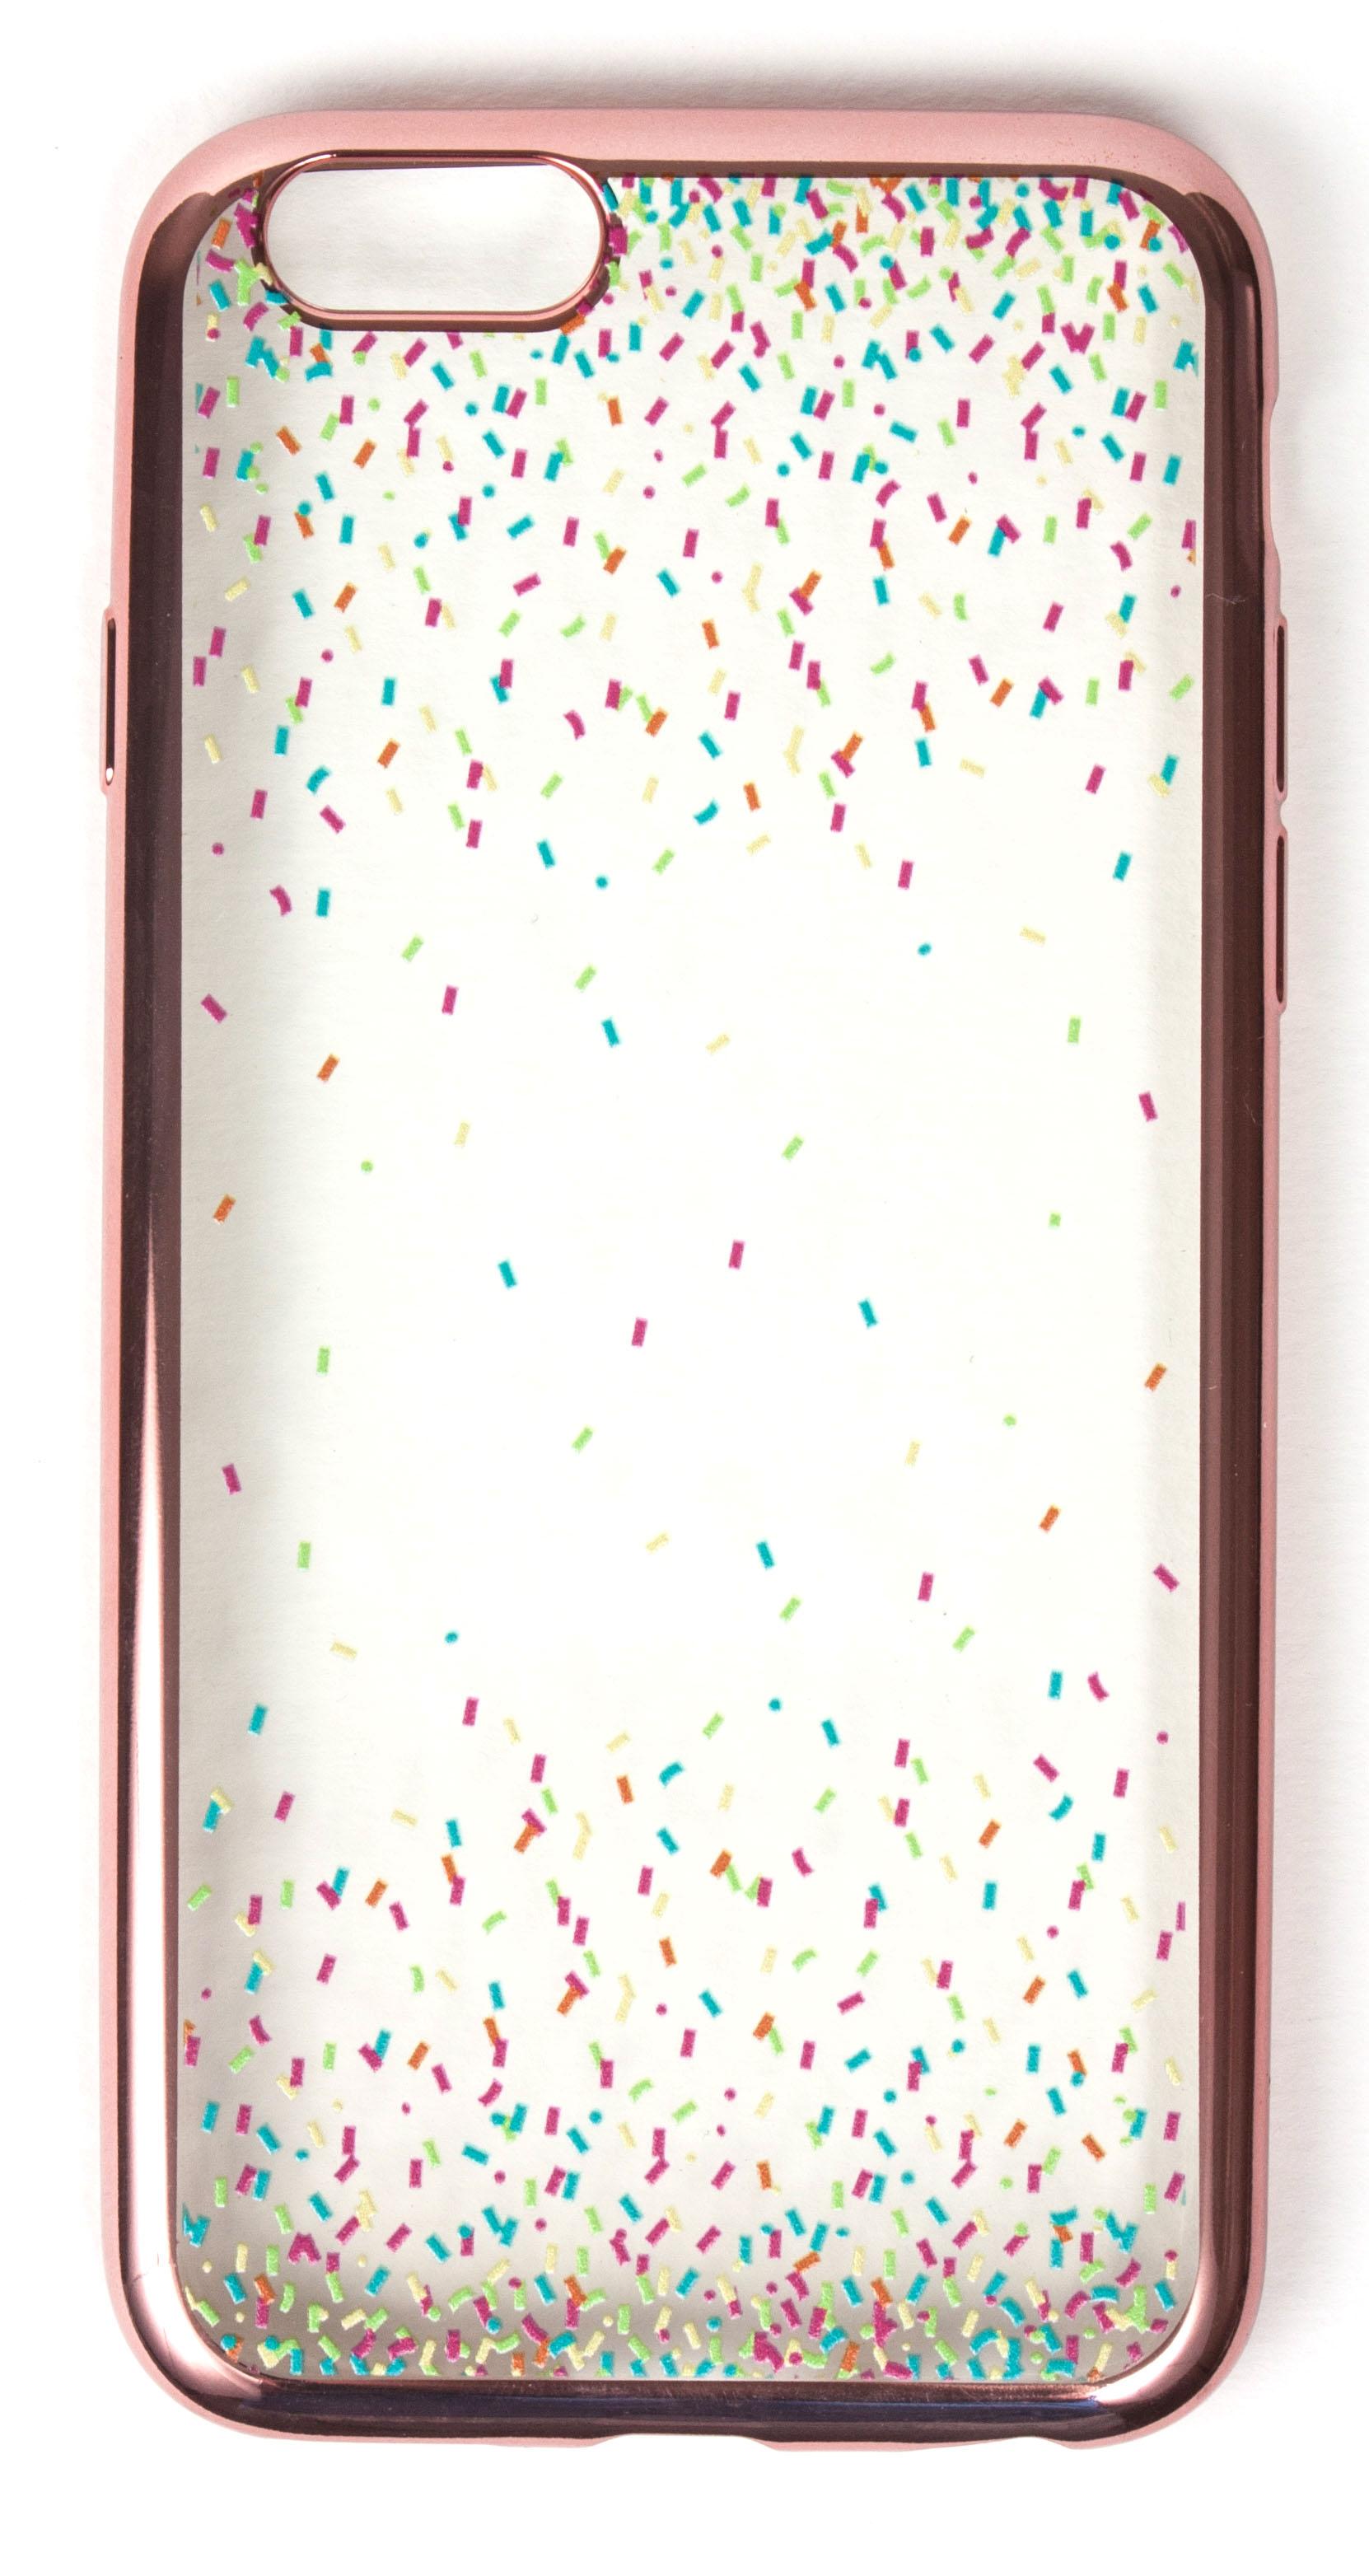 Samsung Galaxy S5 Case, YogaCase MetalEdge Silicone Back Protective Cover (Confetti Rose Gold)